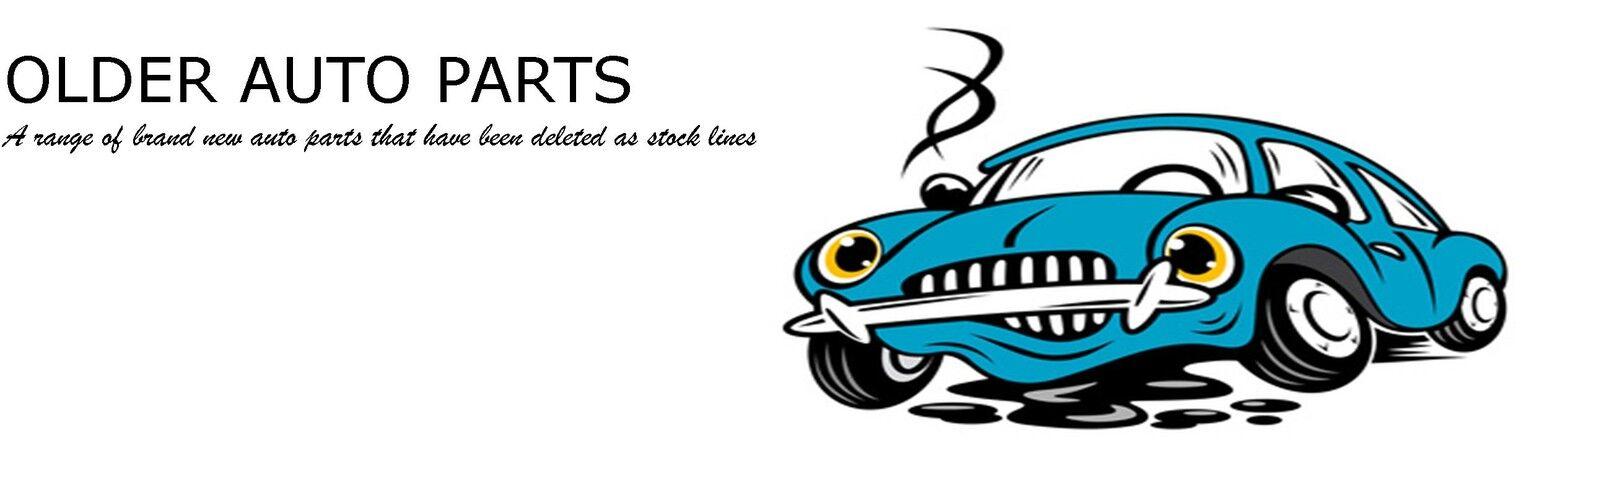 Older Auto Parts